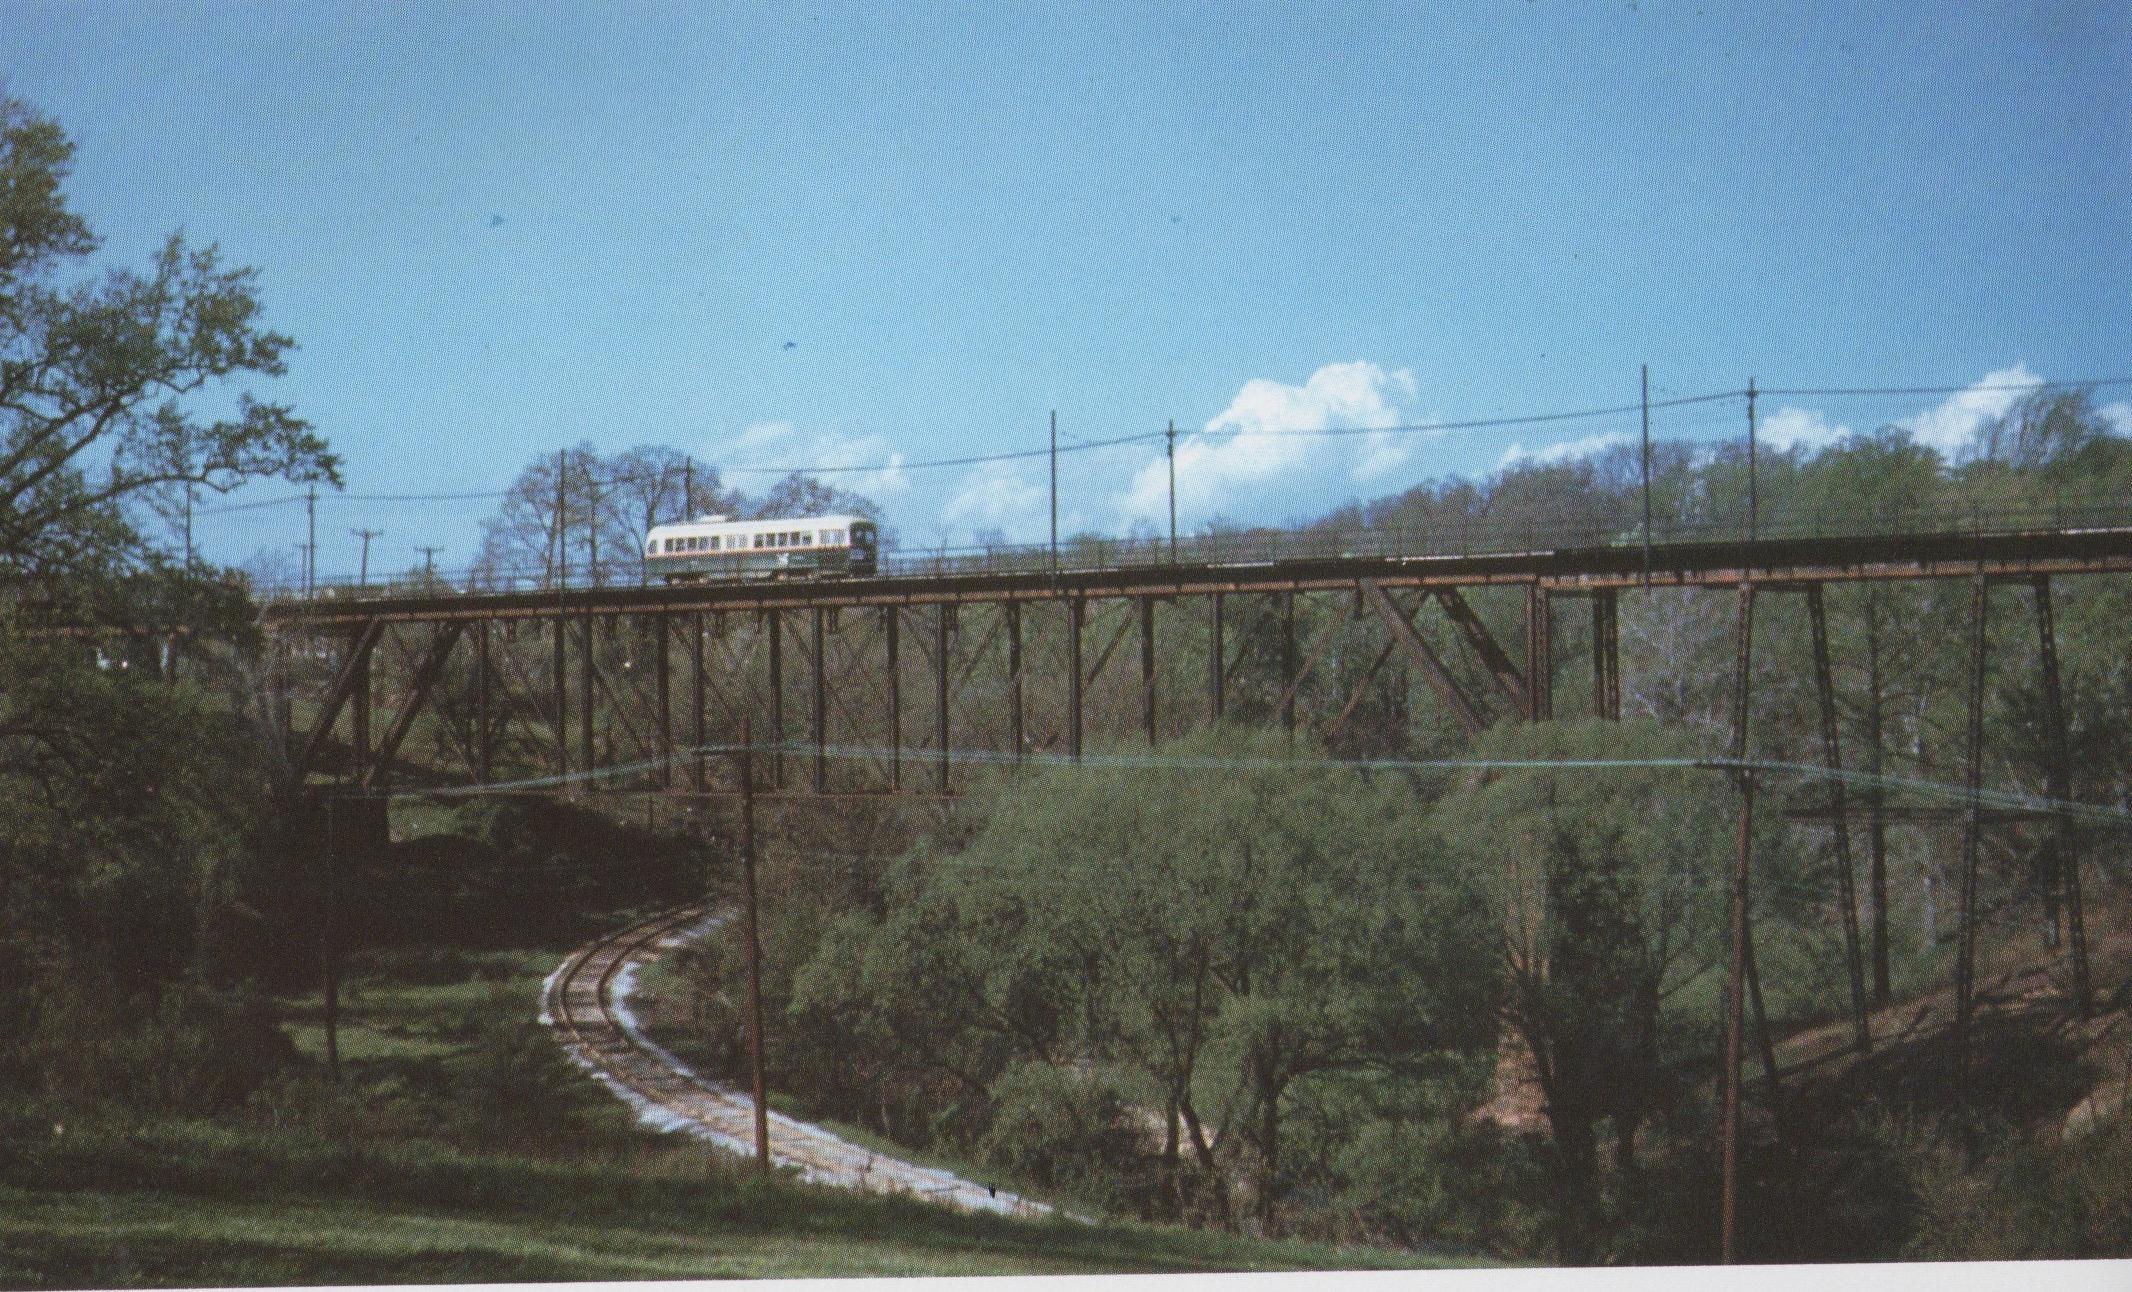 Image Credit: BSM Archive, Huntington Ave Viaduct, 25 line, 1949